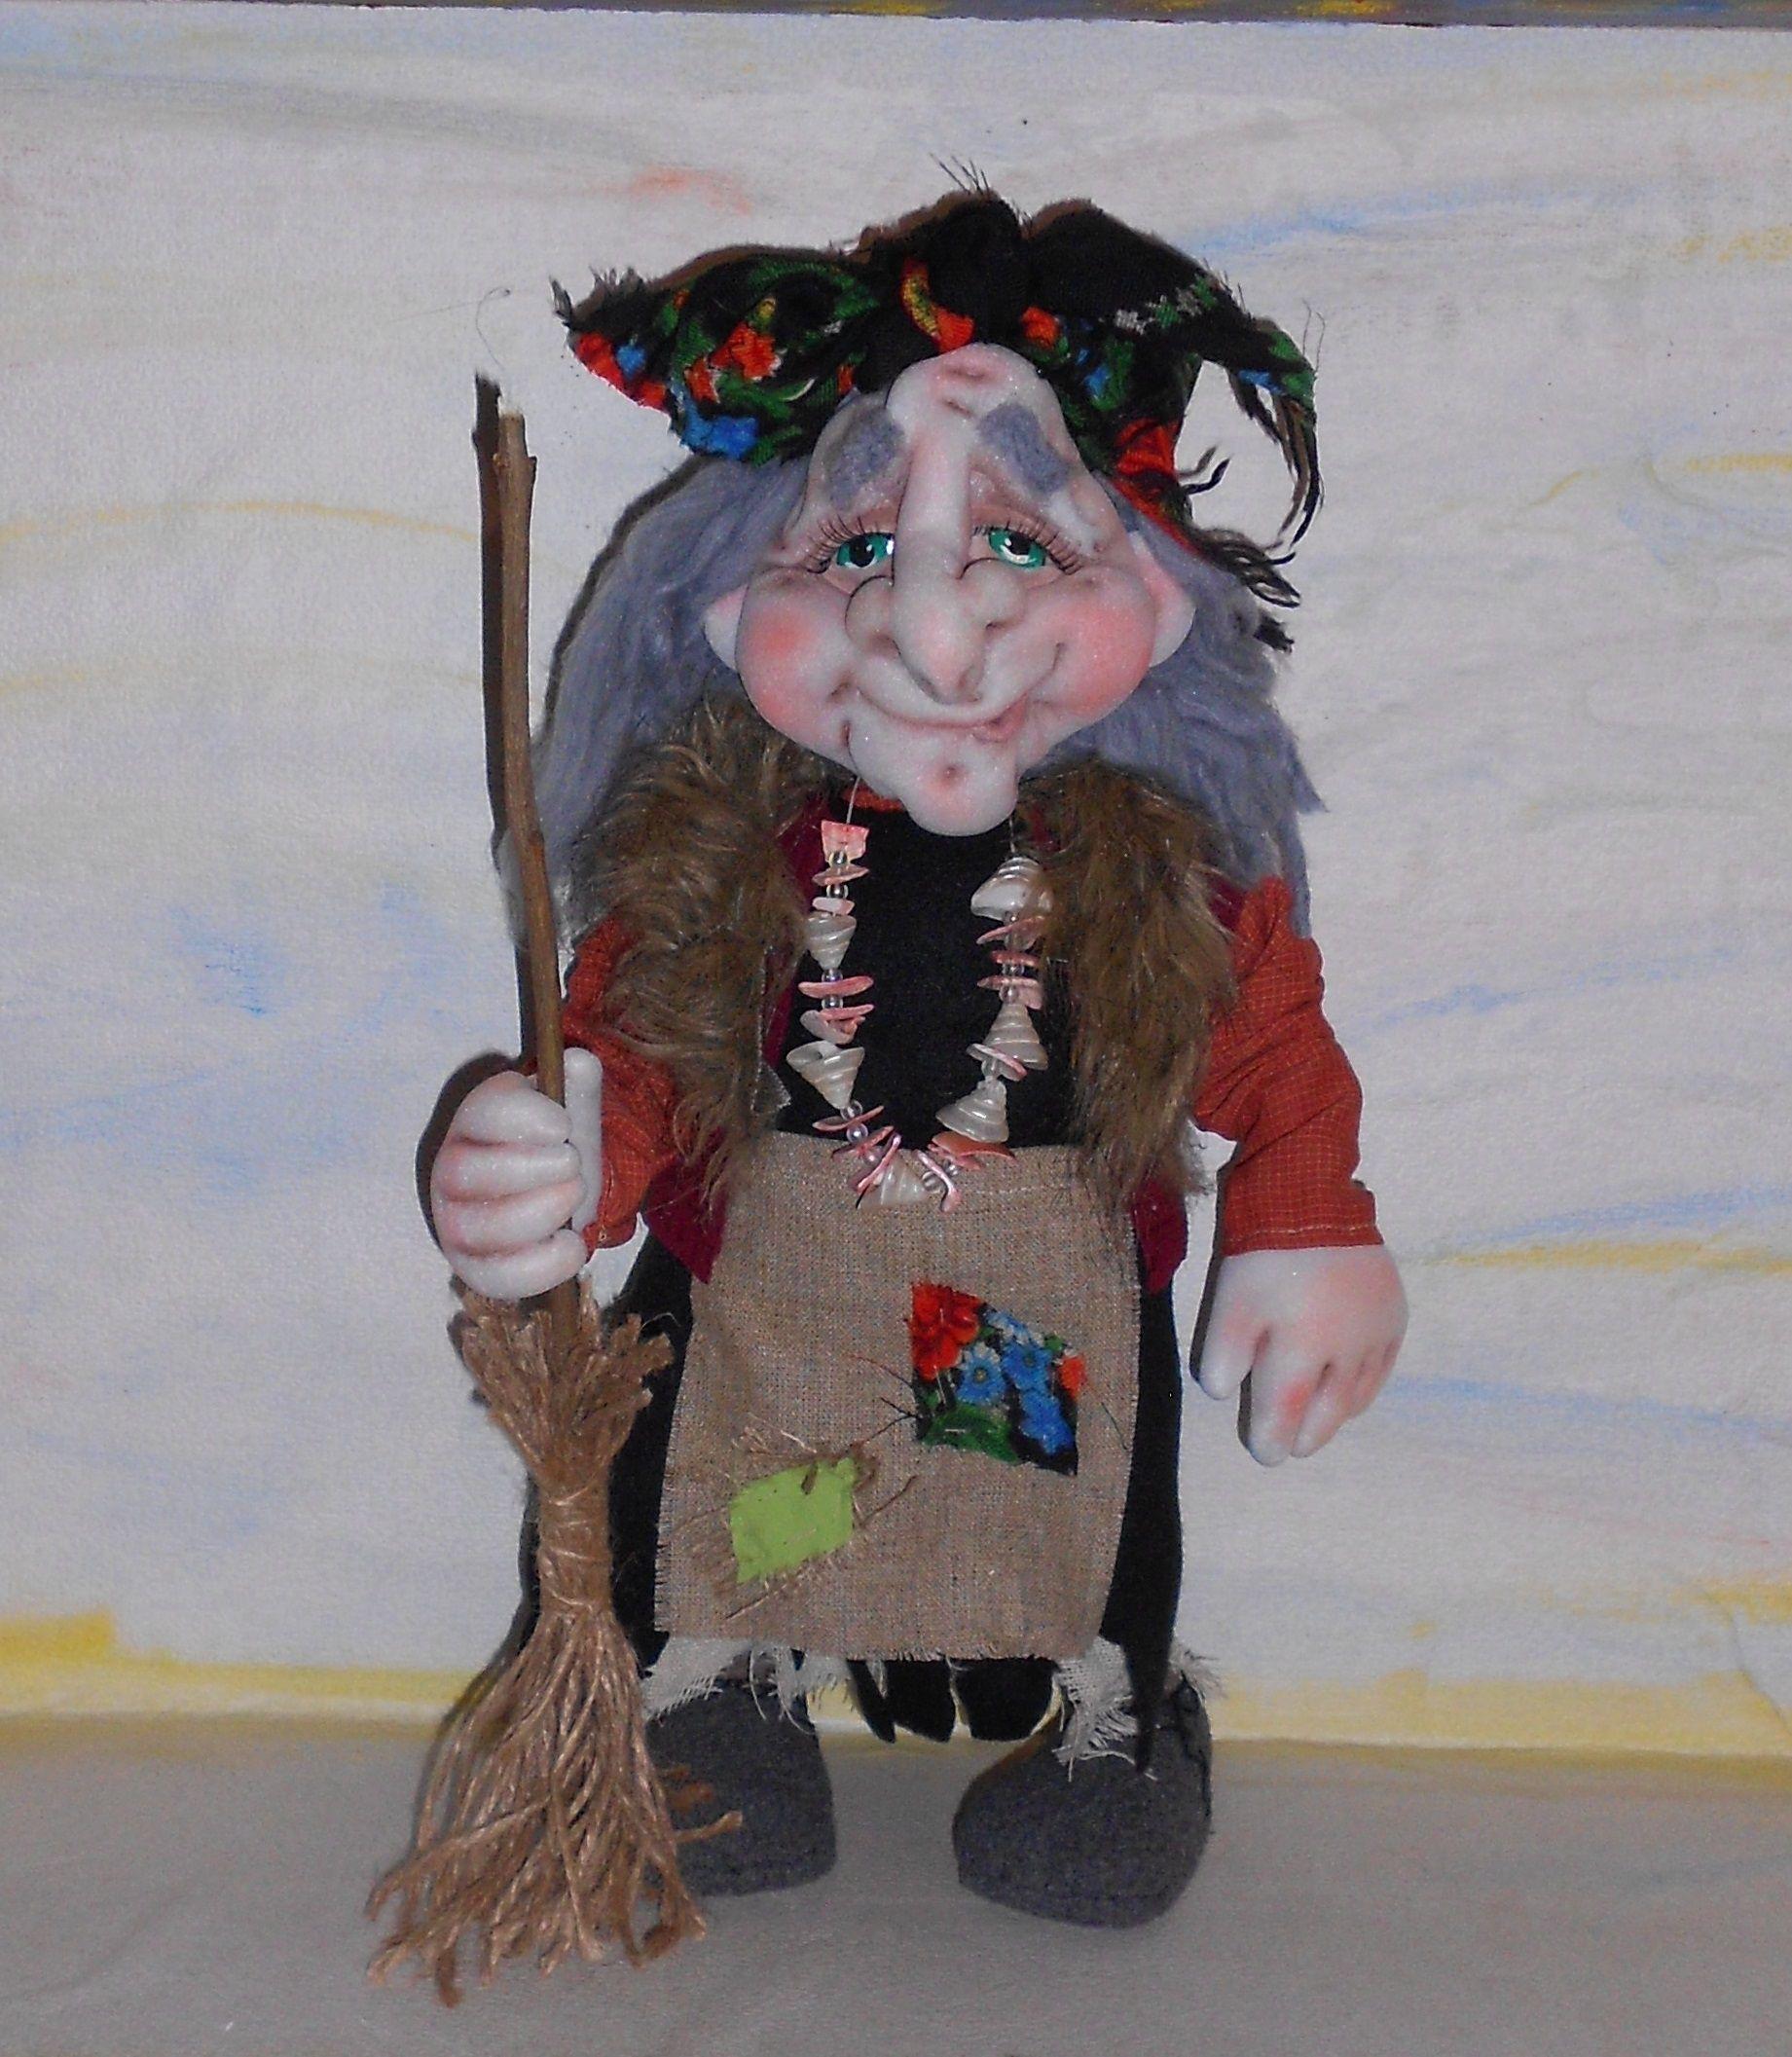 ручная бабкаежка бабаяга чулочная техника оберег работа кукла подарок